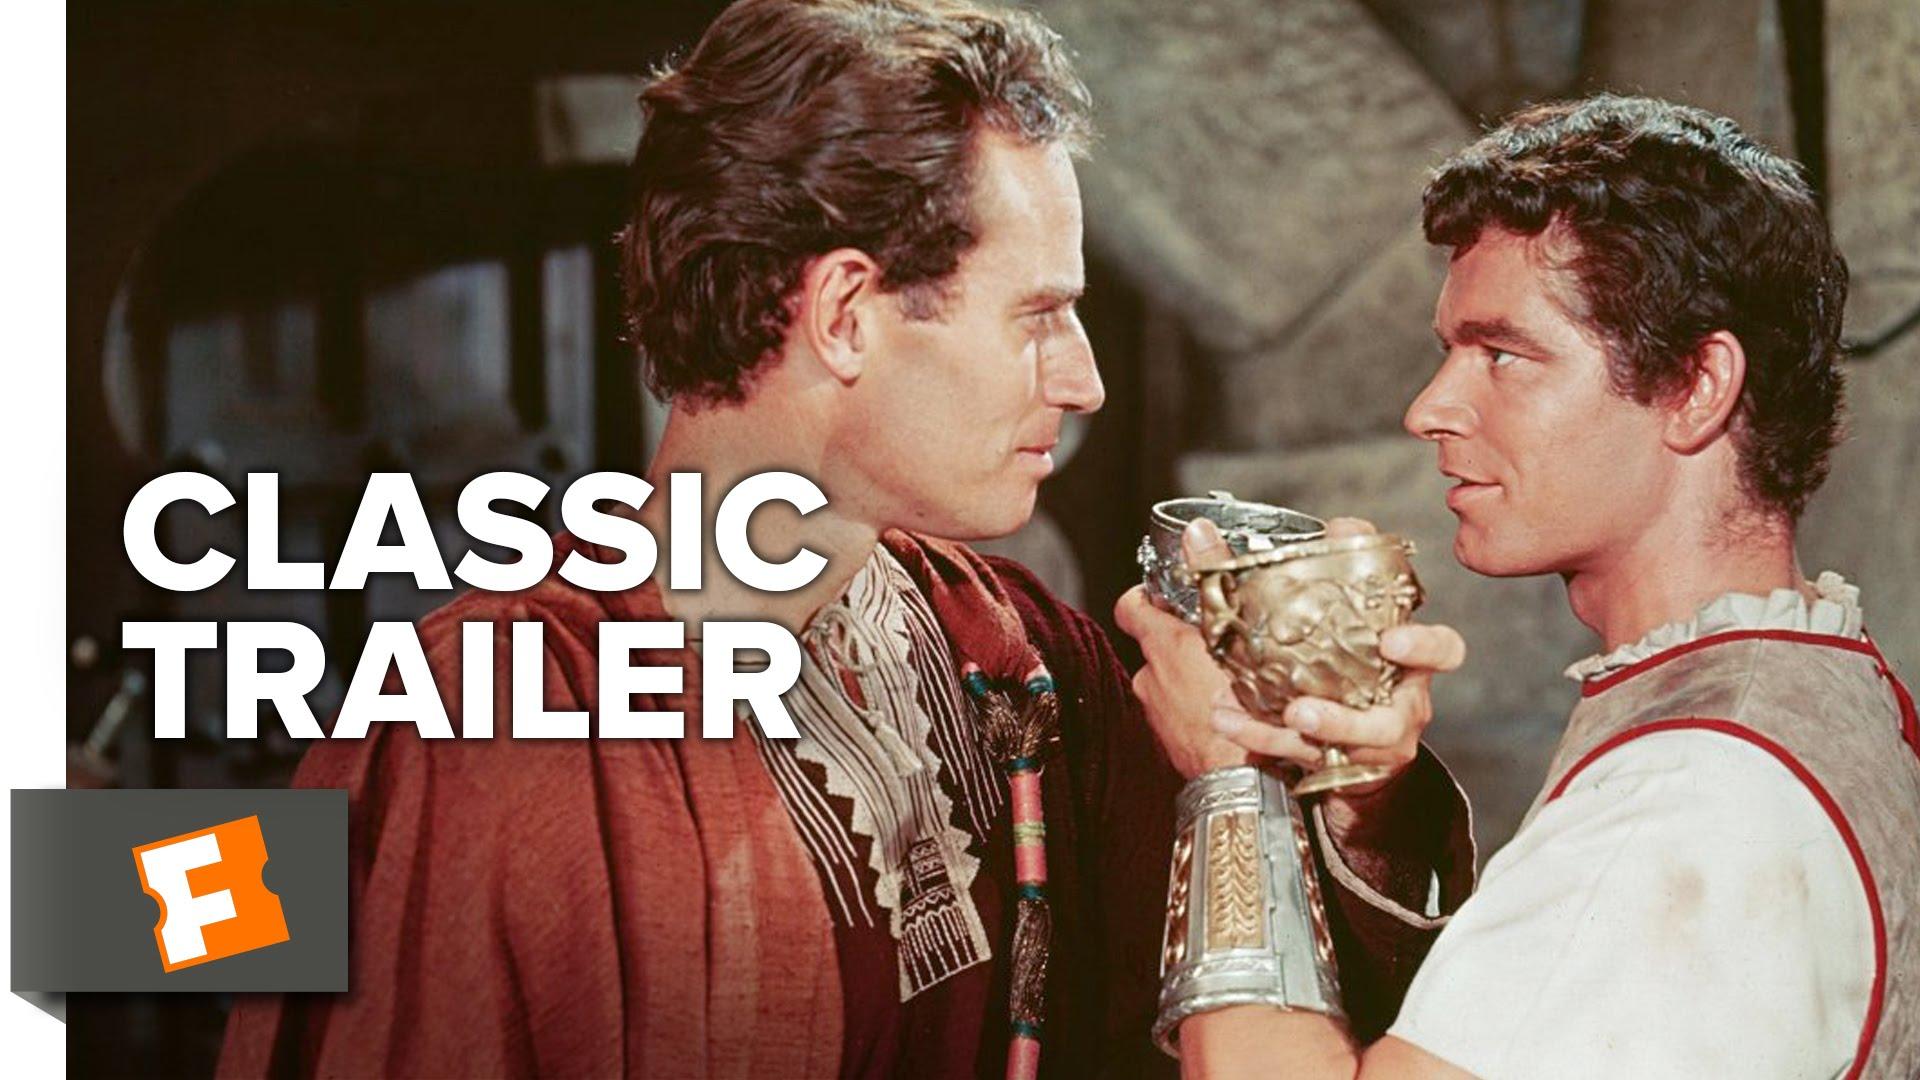 Ben Hur (1959) video/trailer